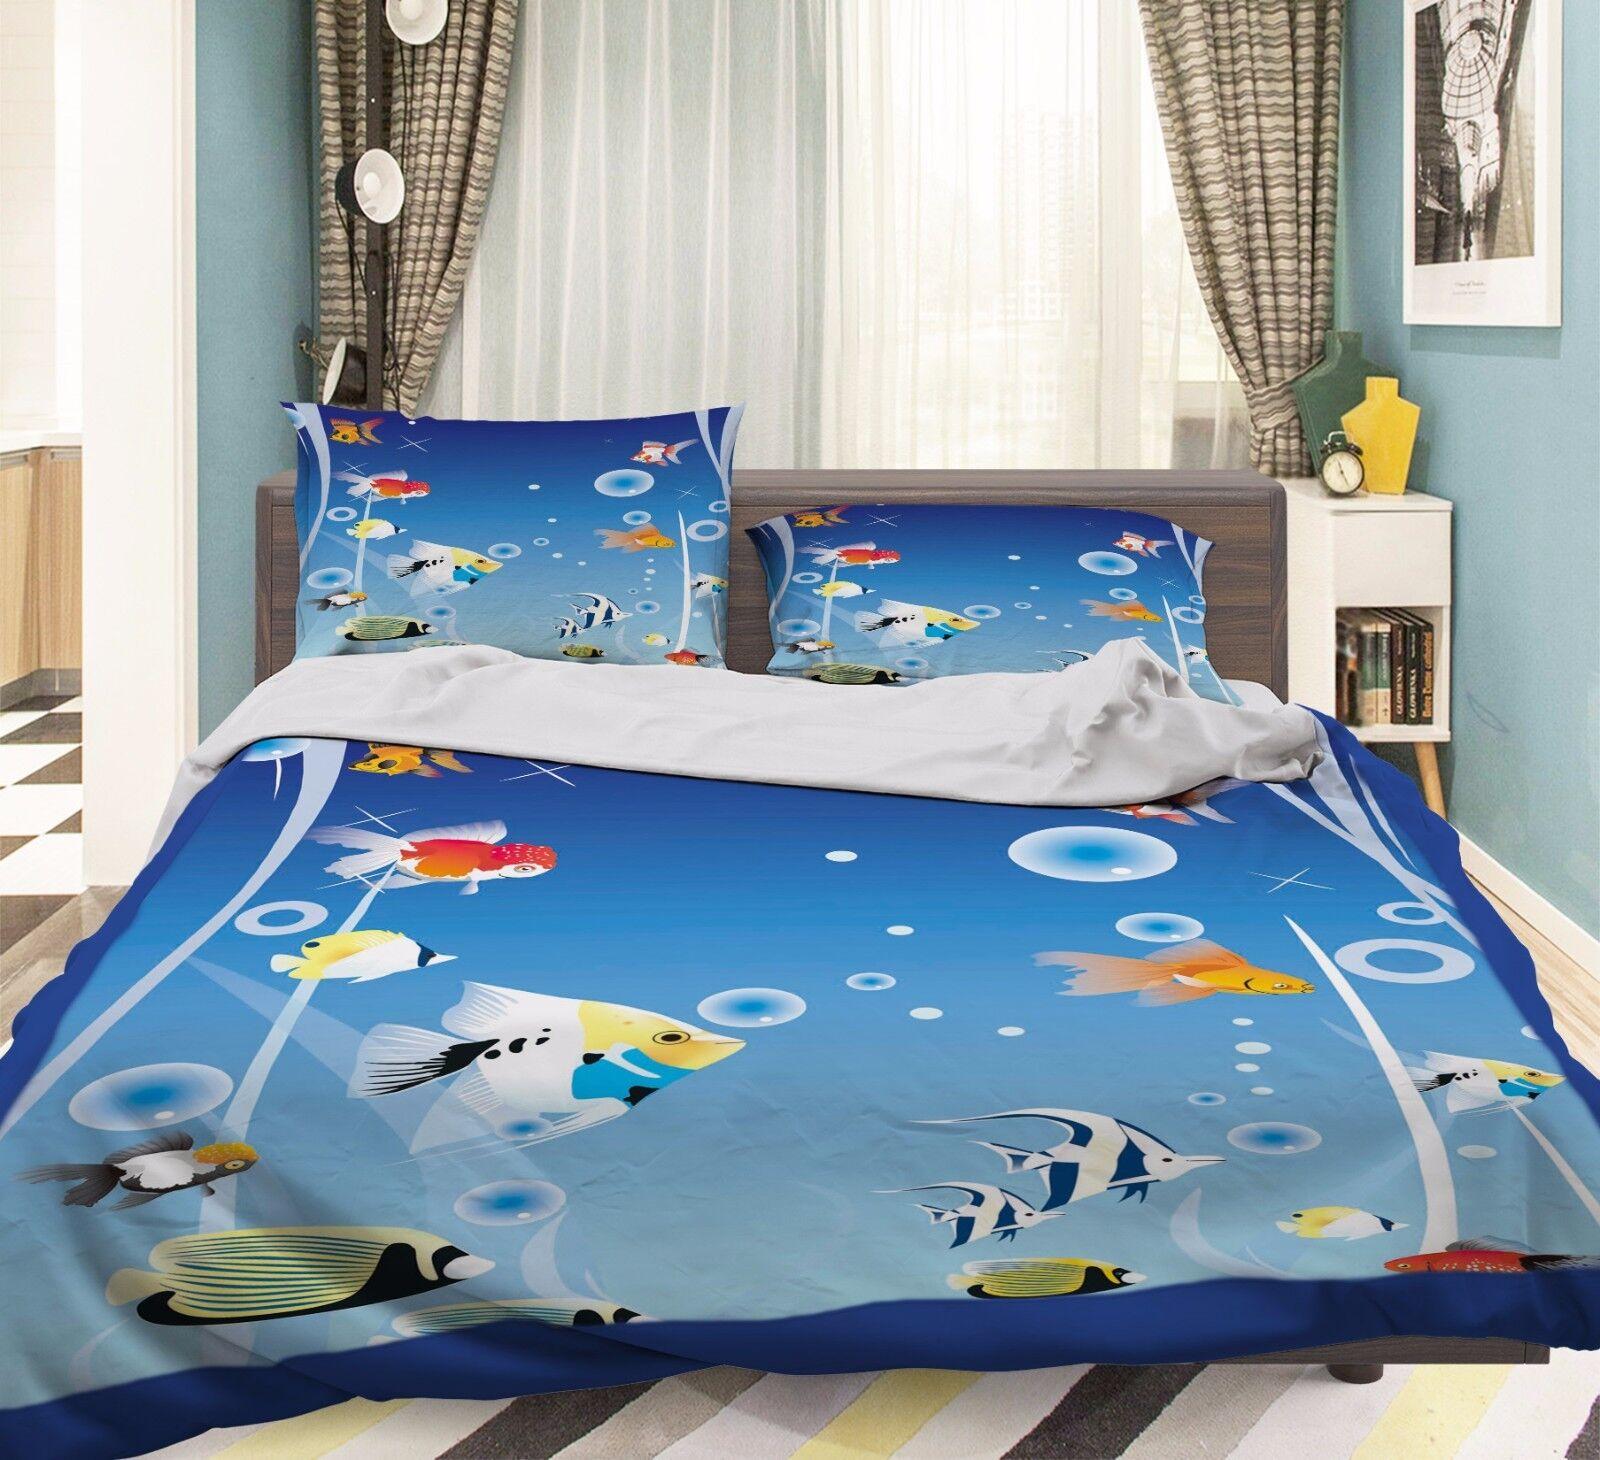 Gut 3d Schöne Prinzessin 533 Japan Anime Bett Kissenbezüge Steppen Duvet Decken Set Bettwäsche Bettwäschegarnituren